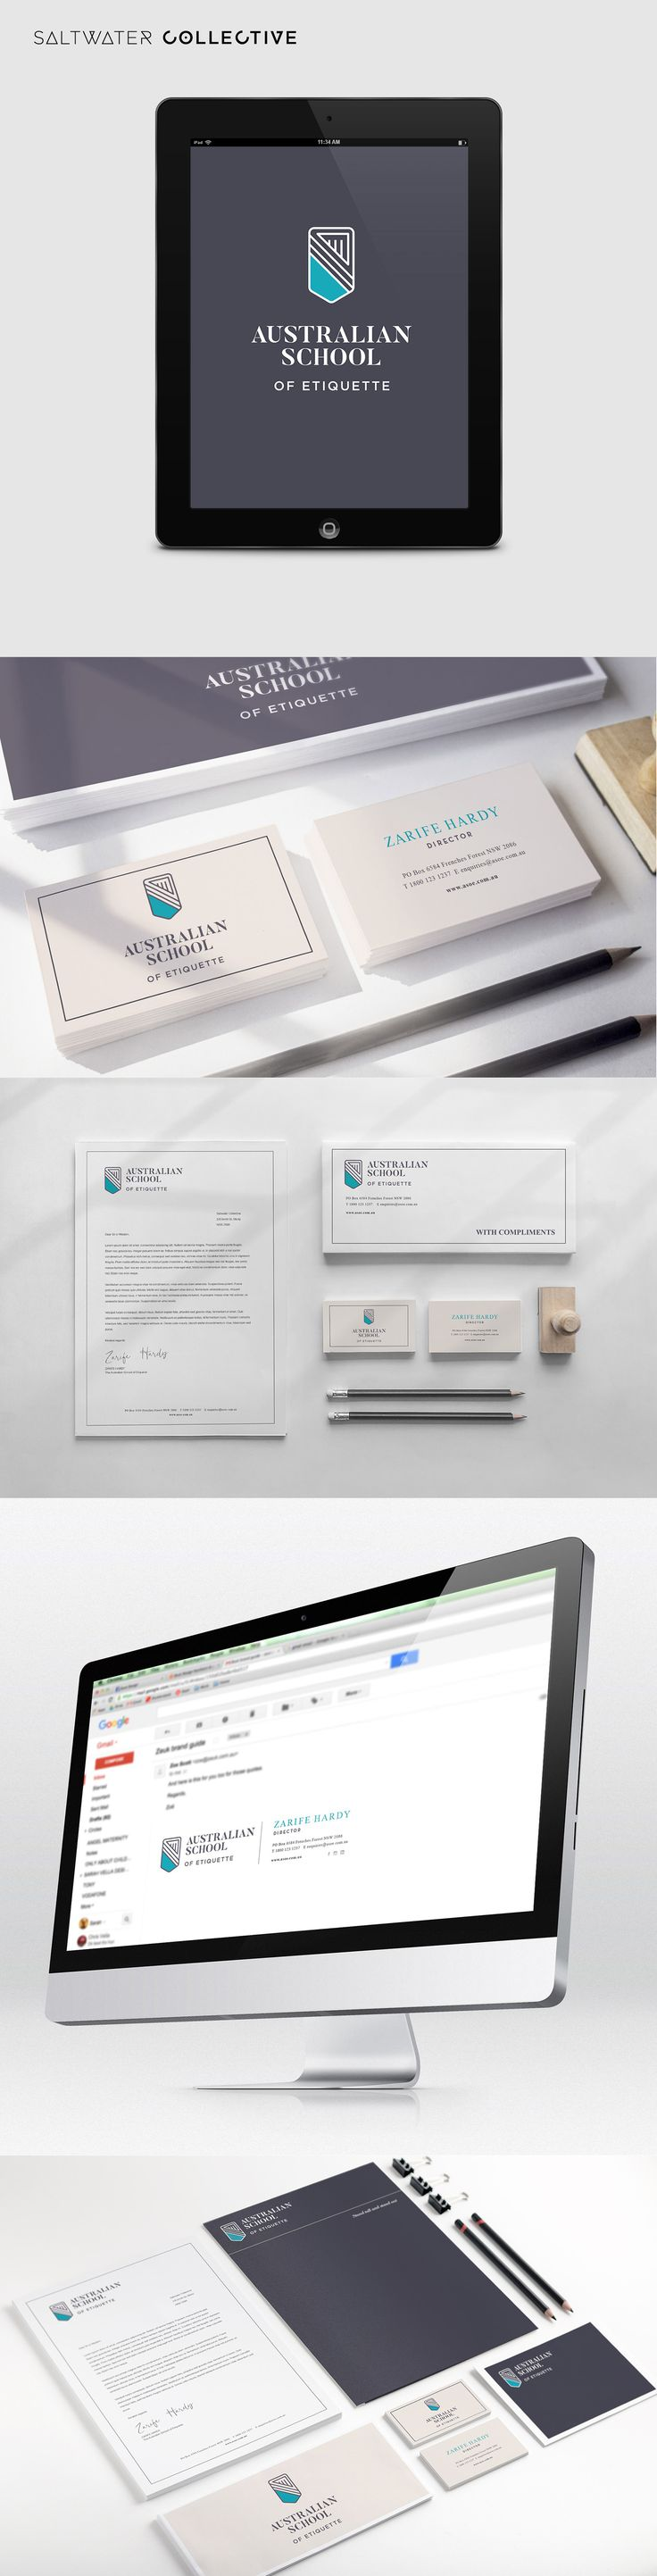 New brand creation for ASOE #DesignedBySWC